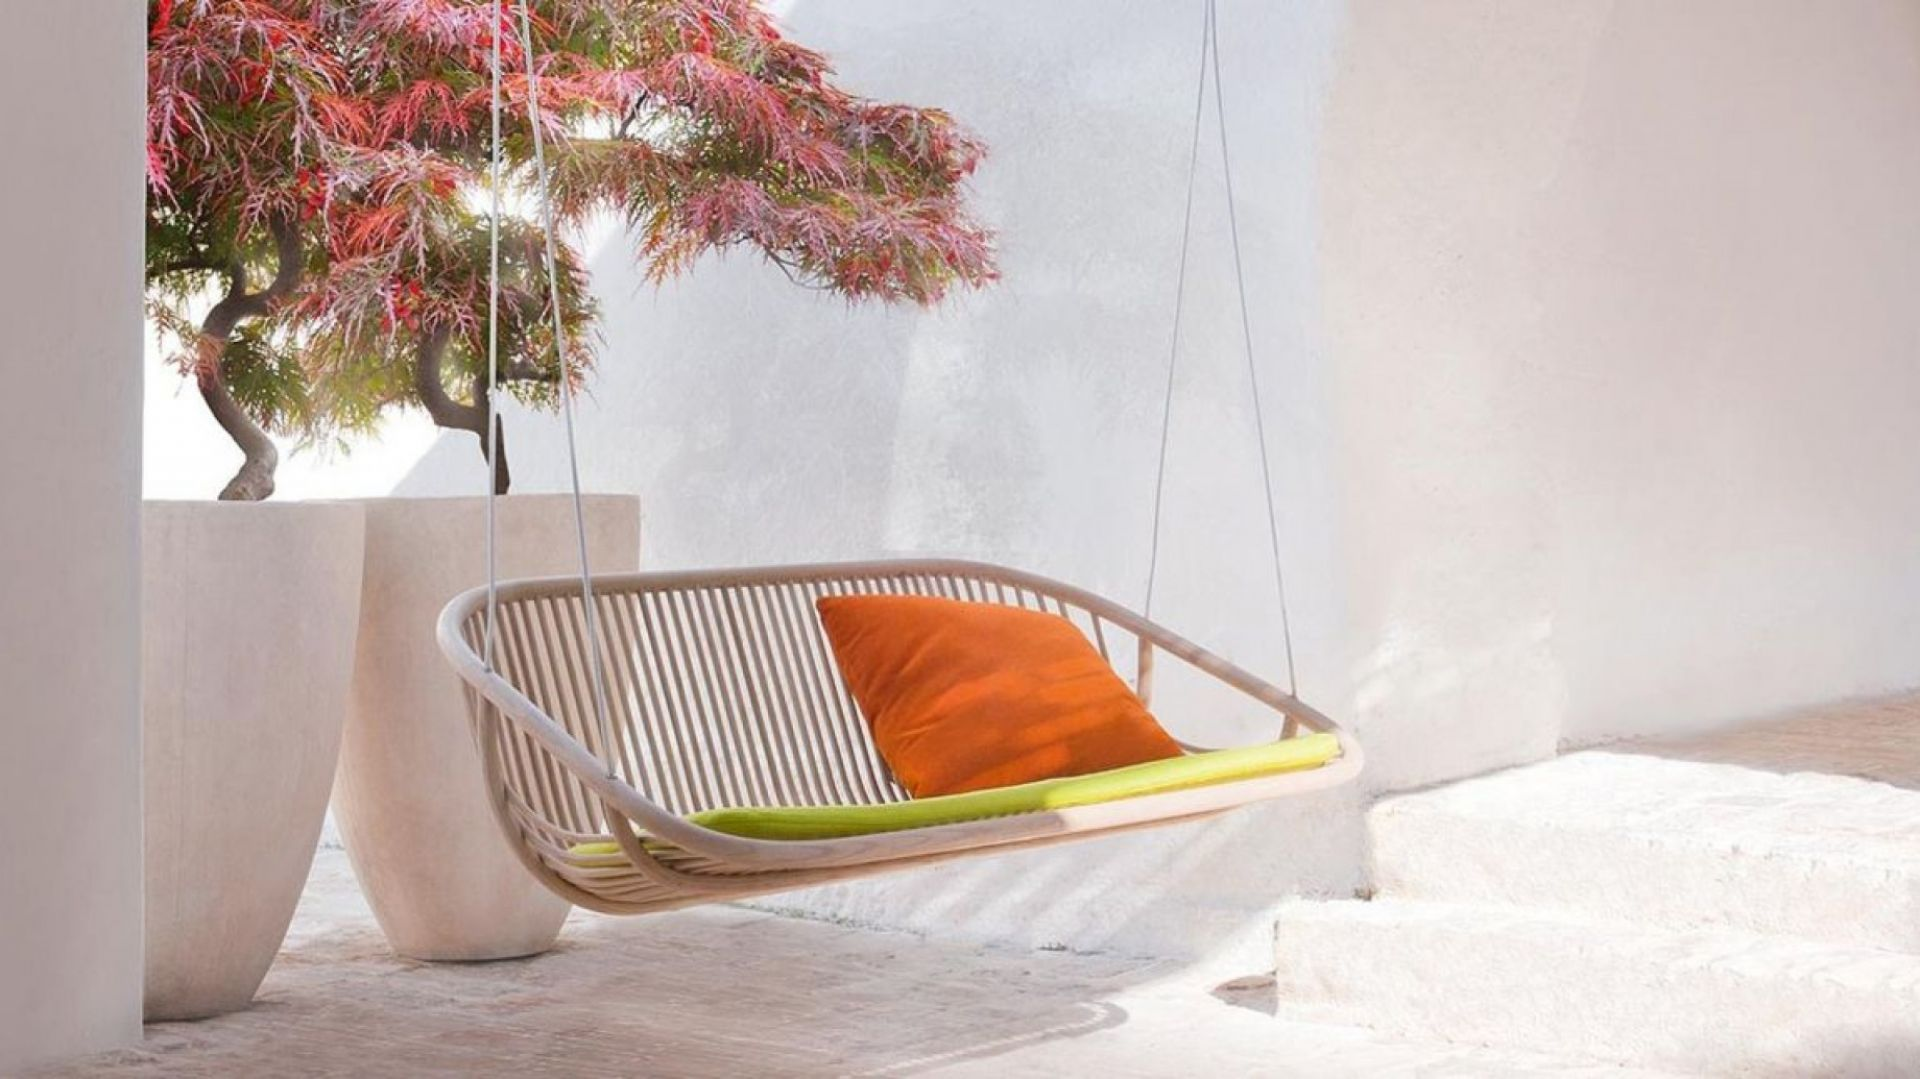 Meble ogrodowe marki Paola Lenti (Roomsdesign). Fot. Paola Lenti